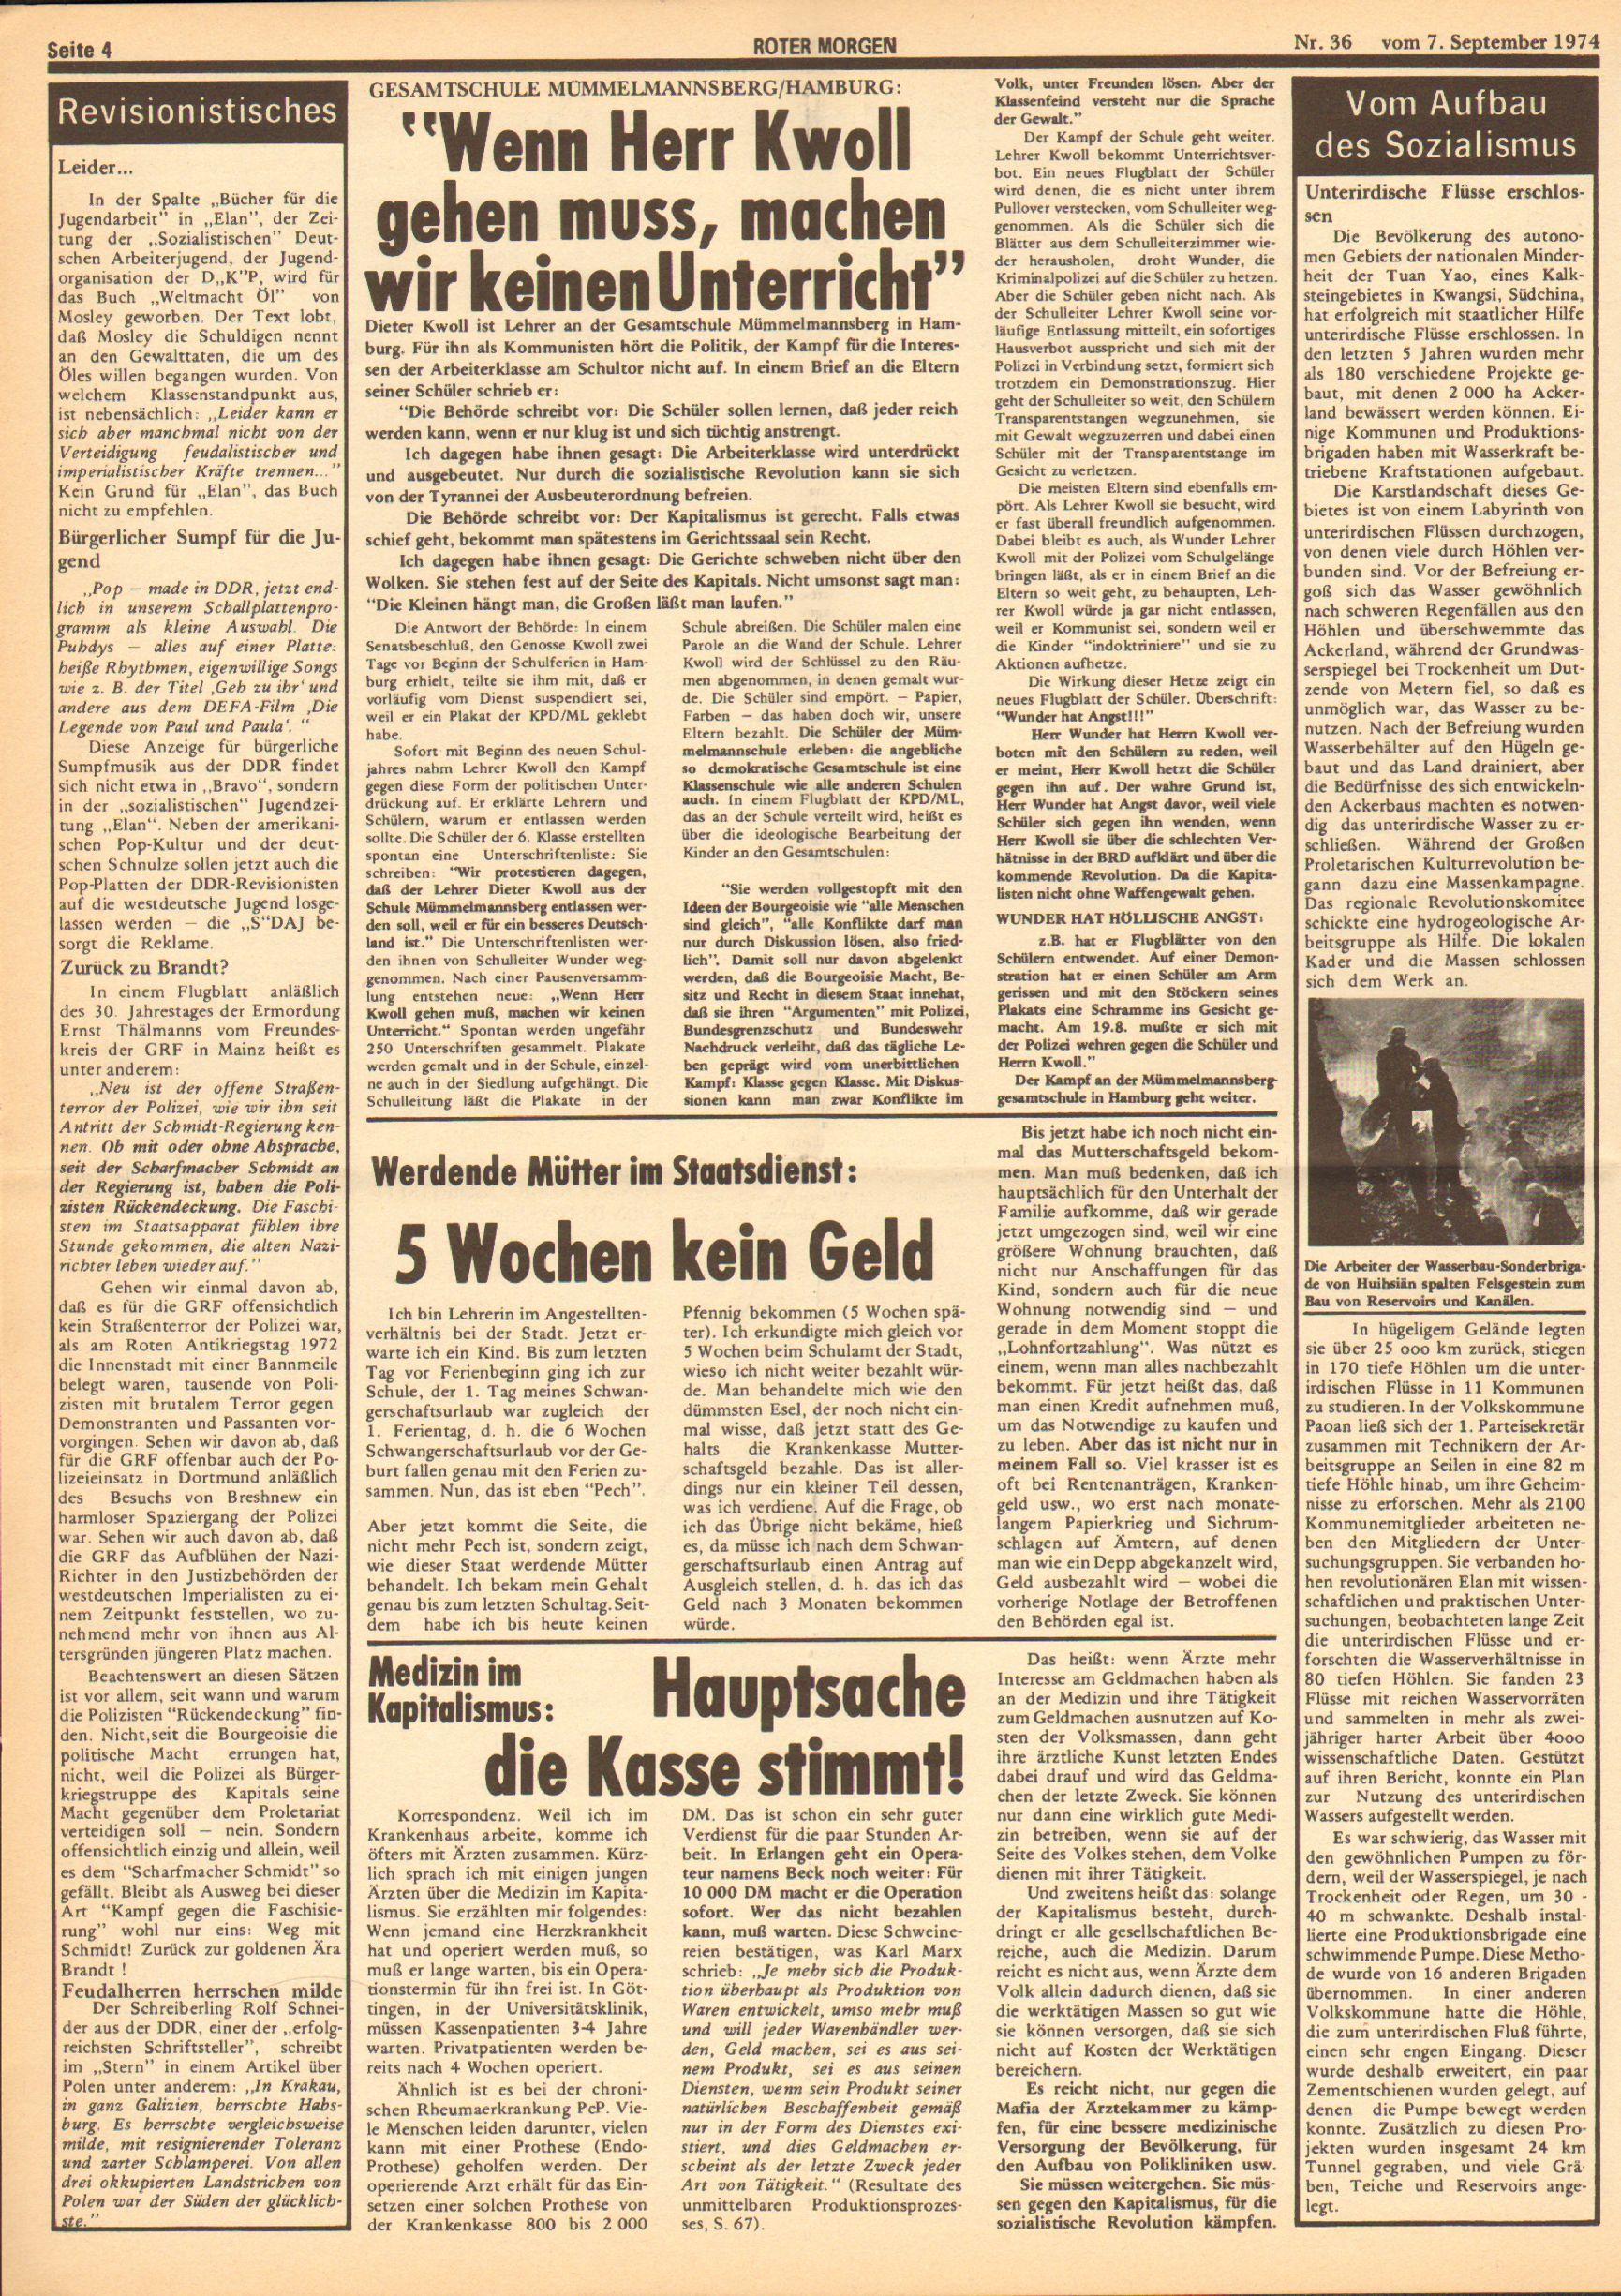 Roter Morgen, 8. Jg., 7. September 1974, Nr. 36, Seite 4